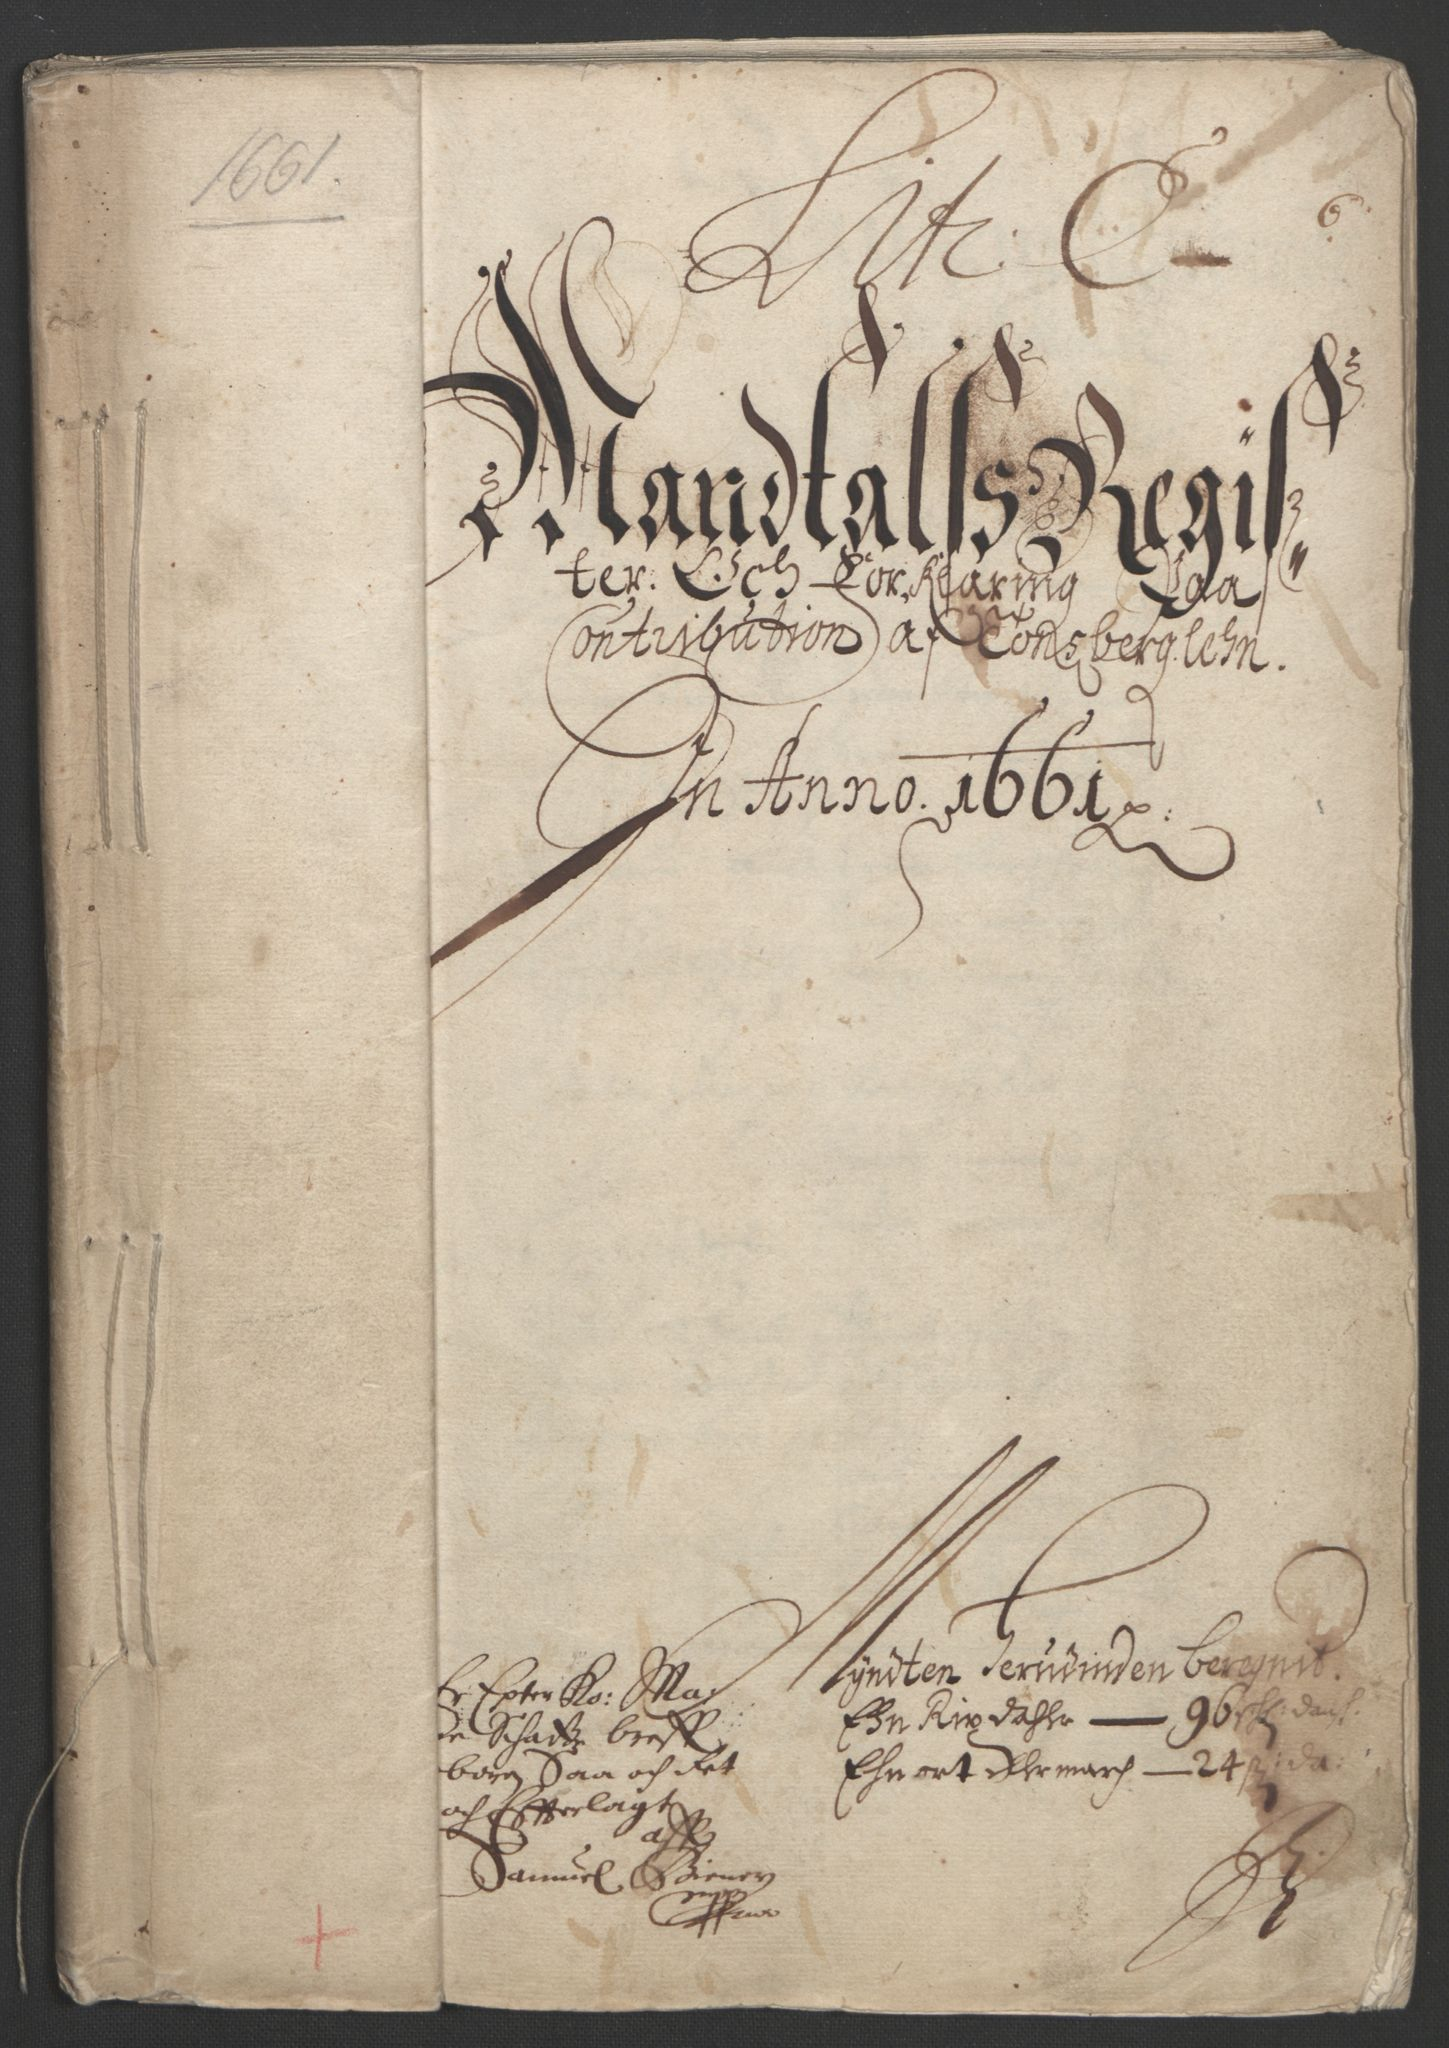 RA, Rentekammeret inntil 1814, Reviderte regnskaper, Fogderegnskap, R32/L1838: Fogderegnskap Jarlsberg grevskap, 1661-1663, s. 38